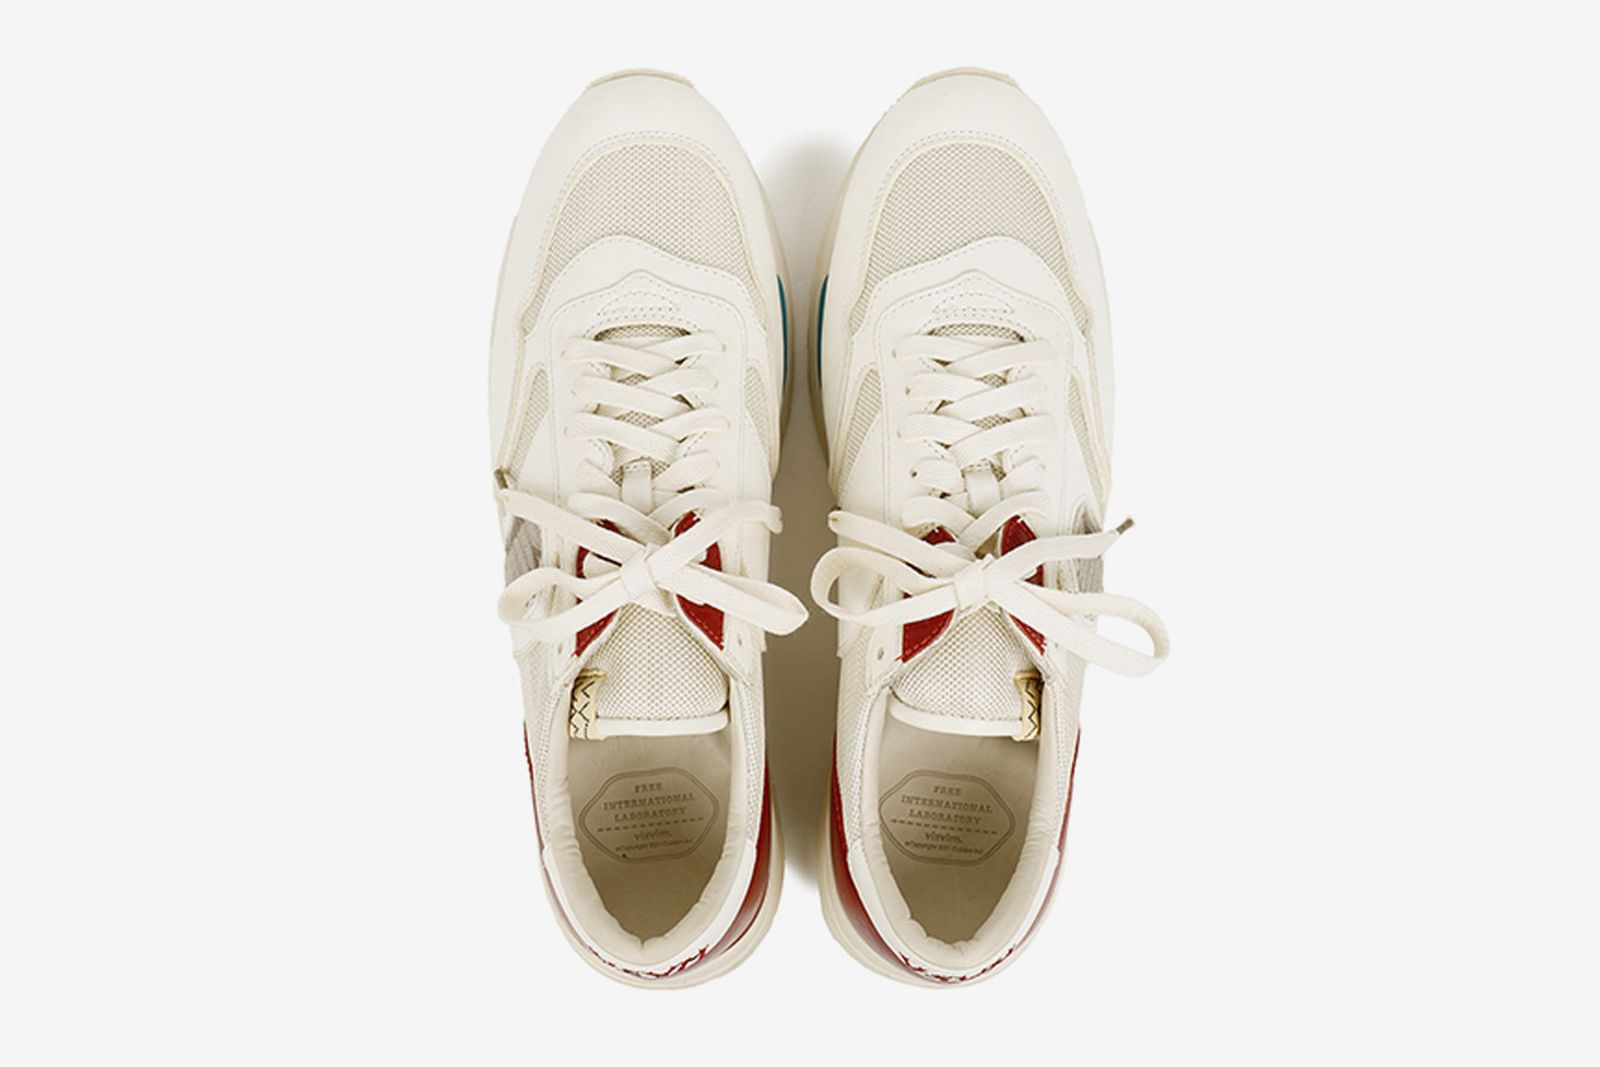 visvim roland jogger spring 2019 colorways buy now